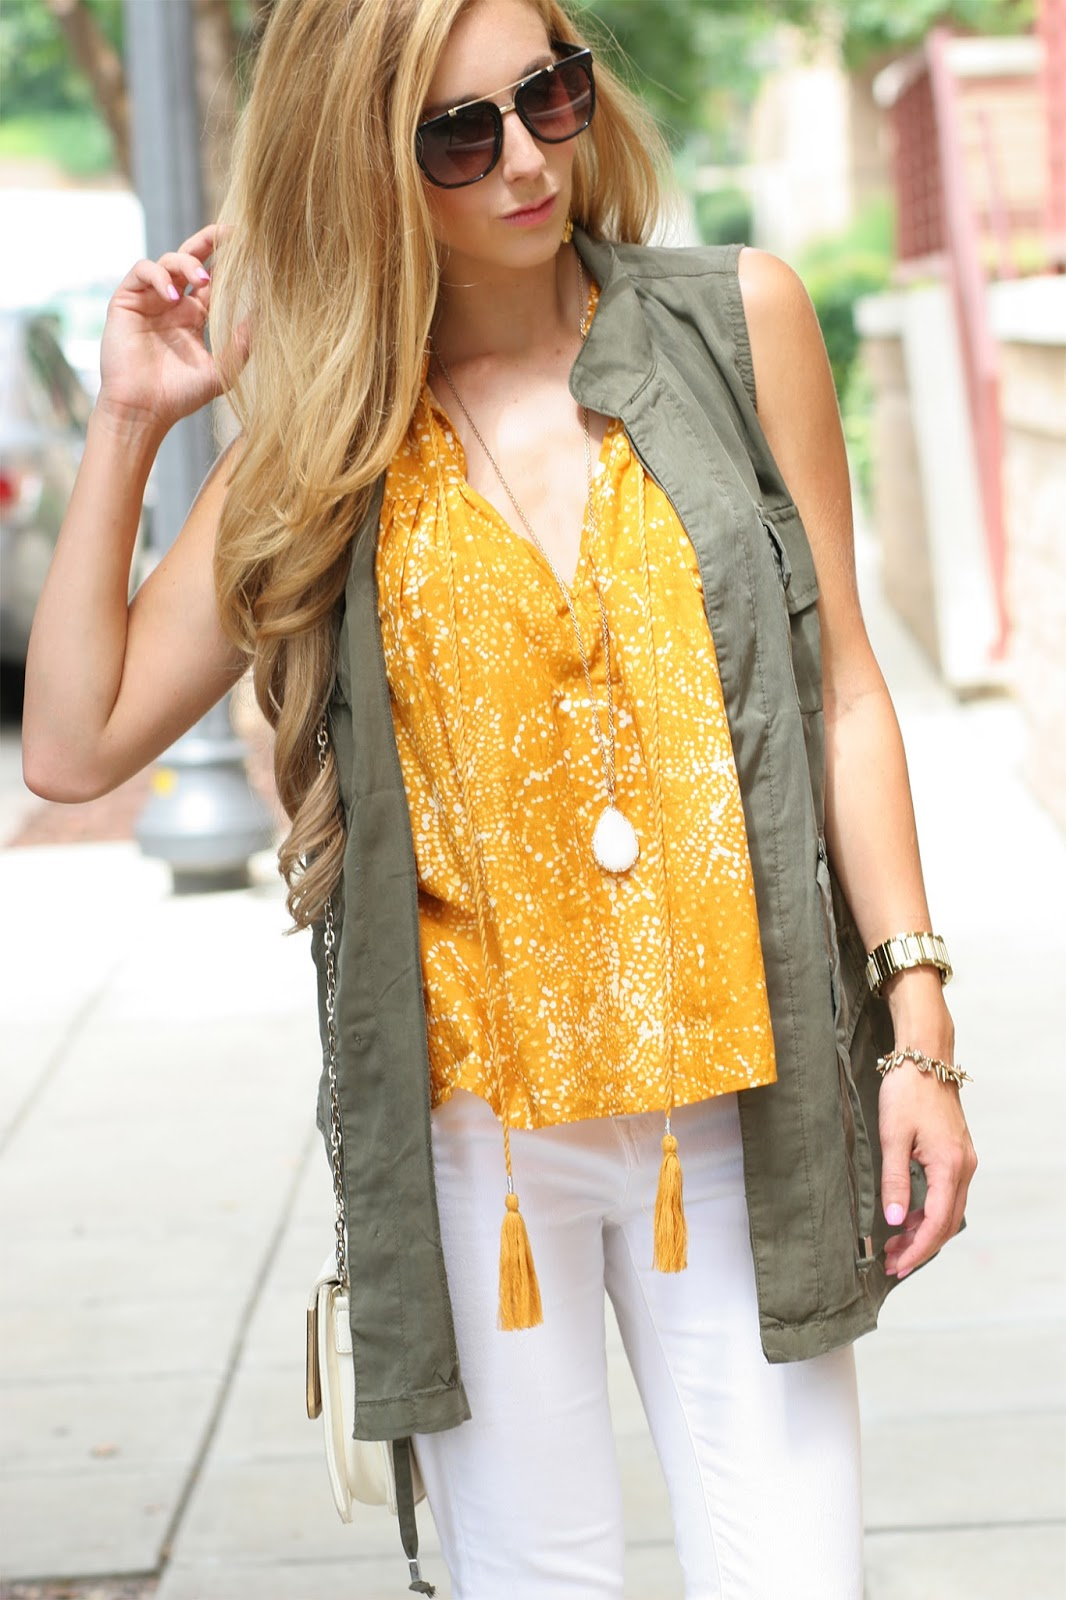 Fashion-blogger-brow-gold-bar-sunglasses-military-jacket-layers